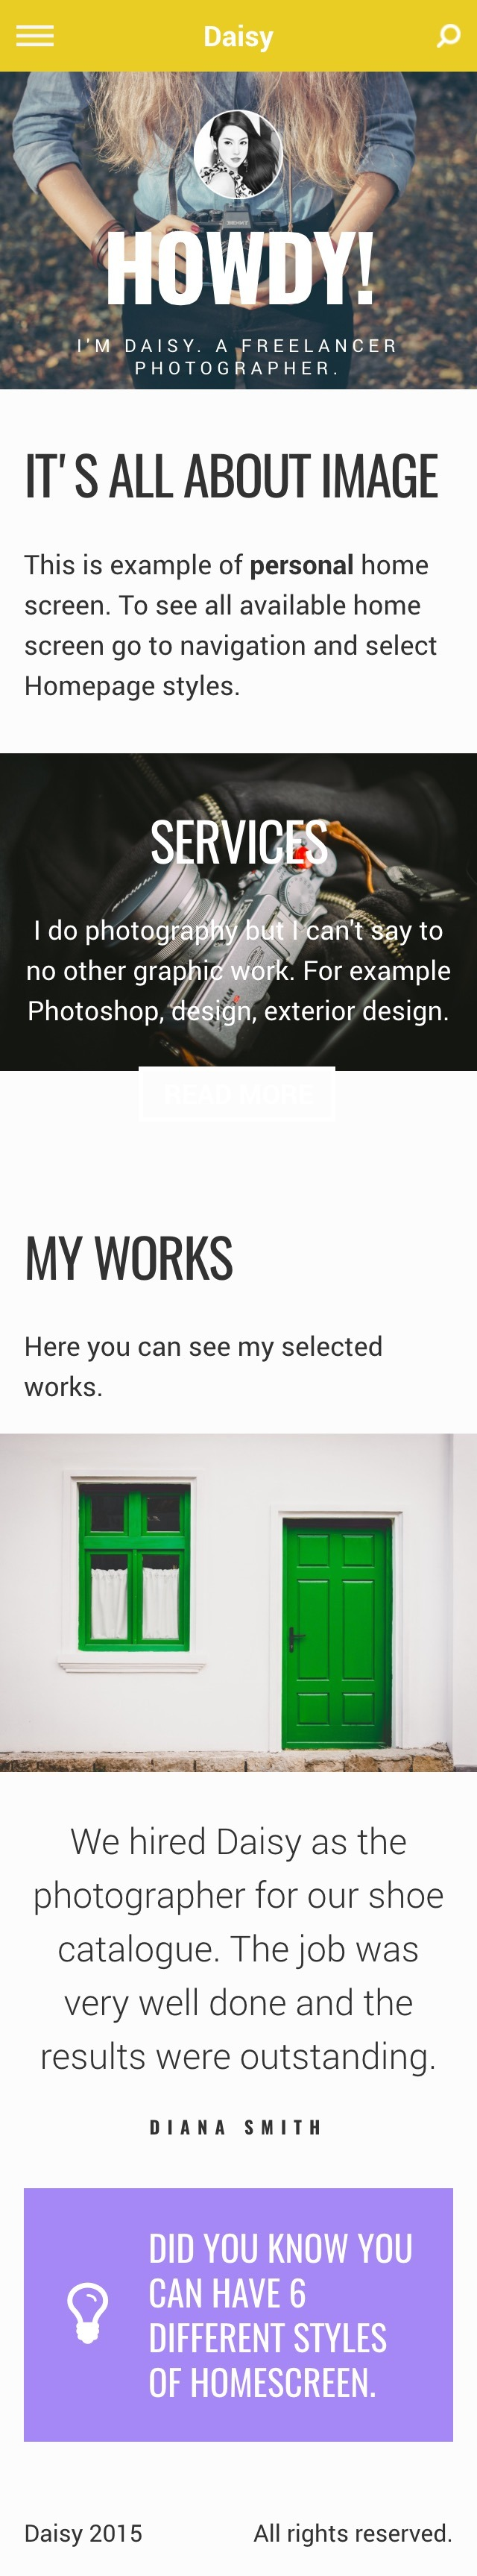 Nightly | A Bold jQuery Mobile Template by lukepostulka | ThemeForest